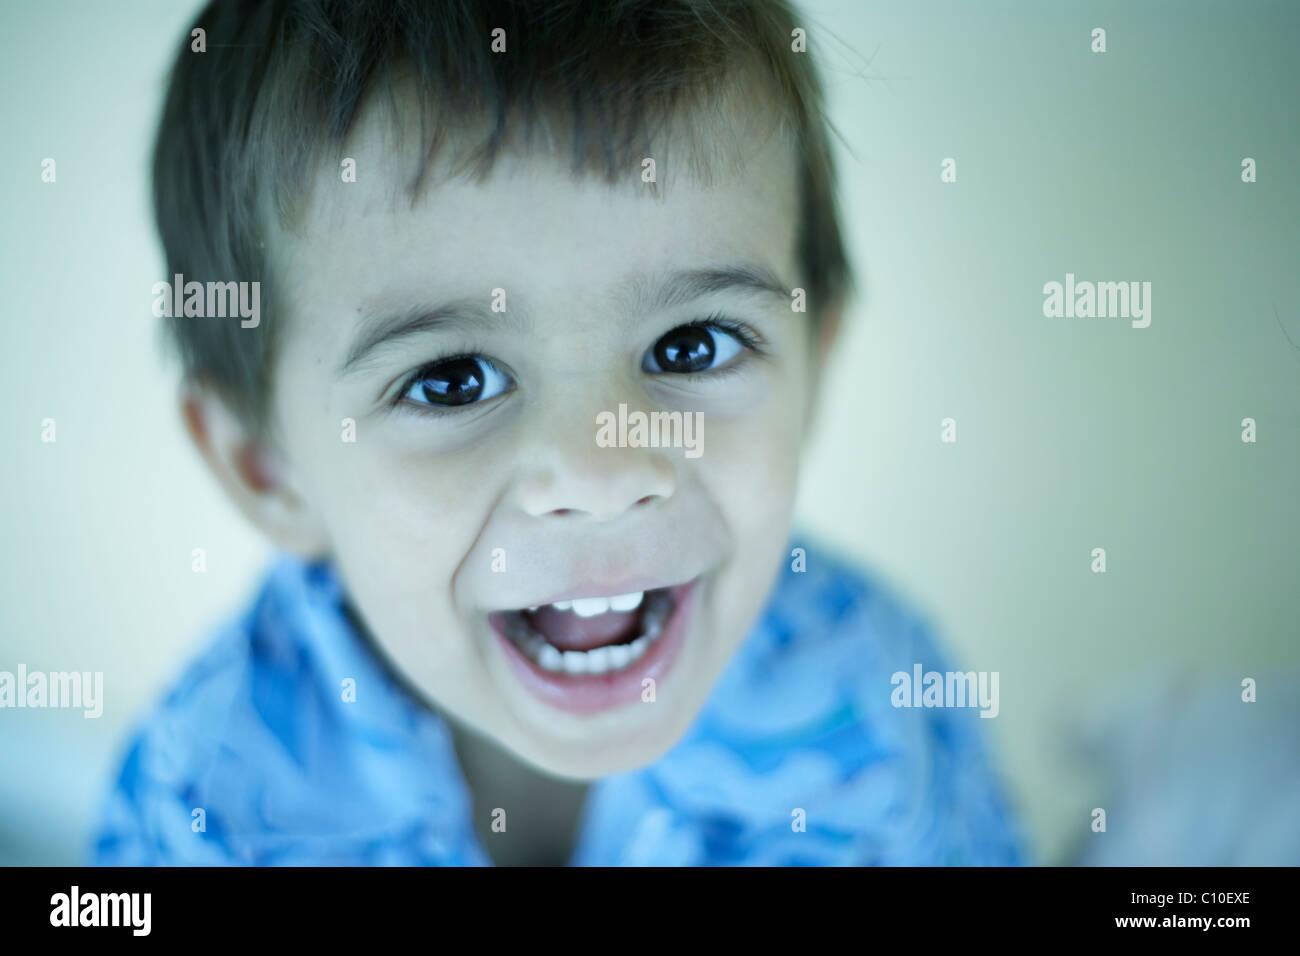 Happy smiling toddler, boy aged 3 - Stock Image